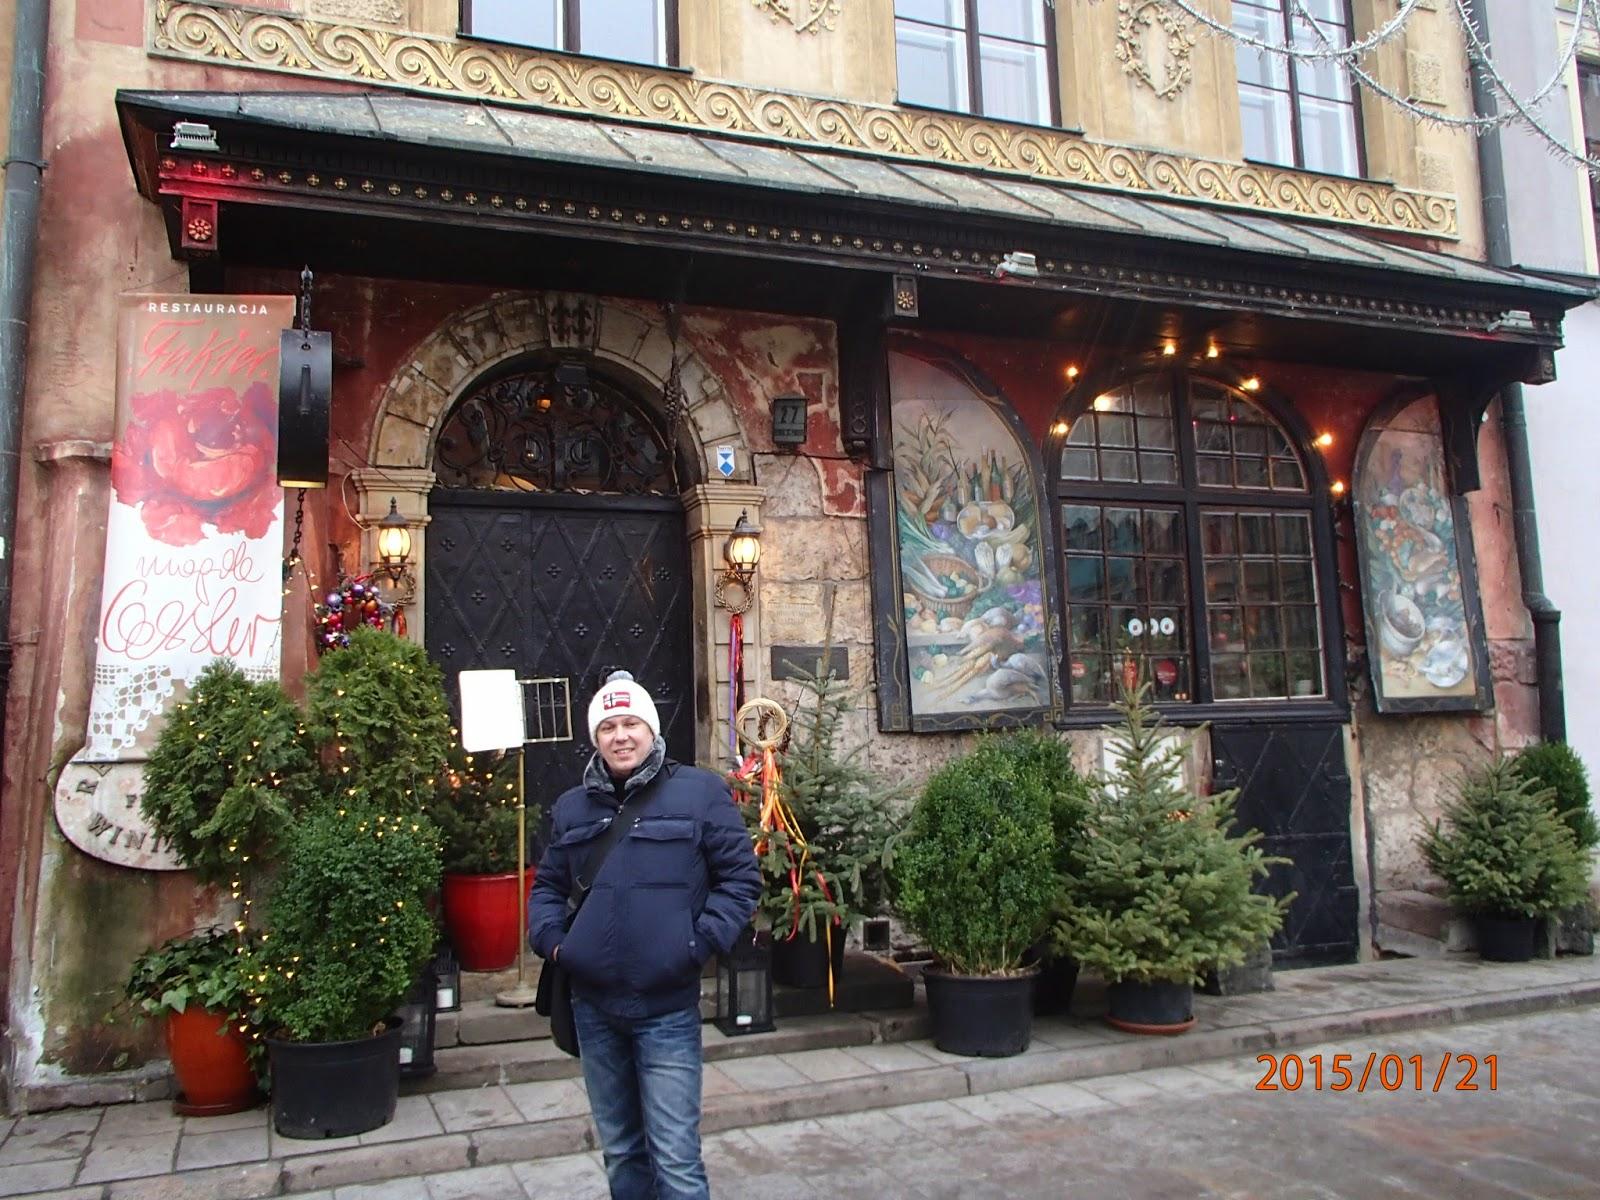 U Fukiera: Kulinarny Świat: U FUKIERA, Magdy Gessler